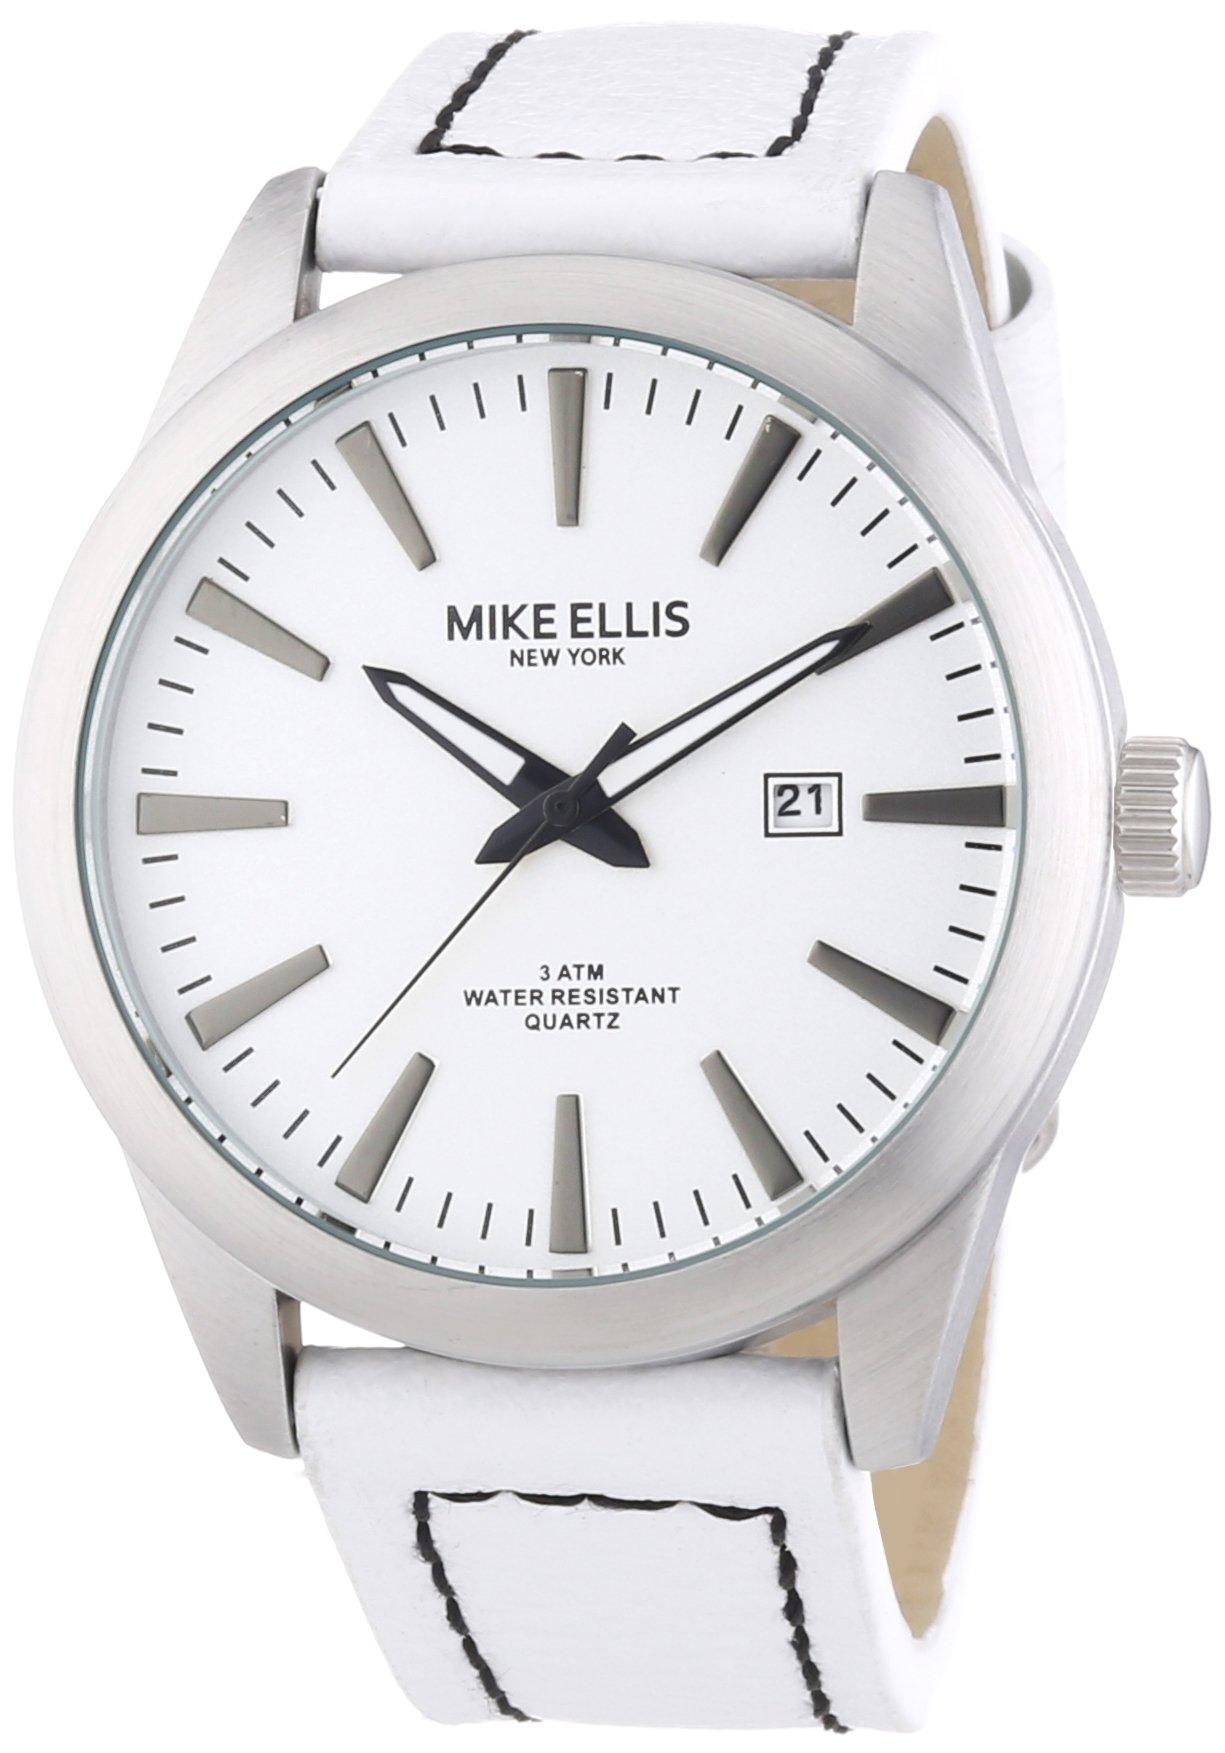 Mike-Ellis-New-York-Herren-Armbanduhr-XL-Analog-Quarz-17993